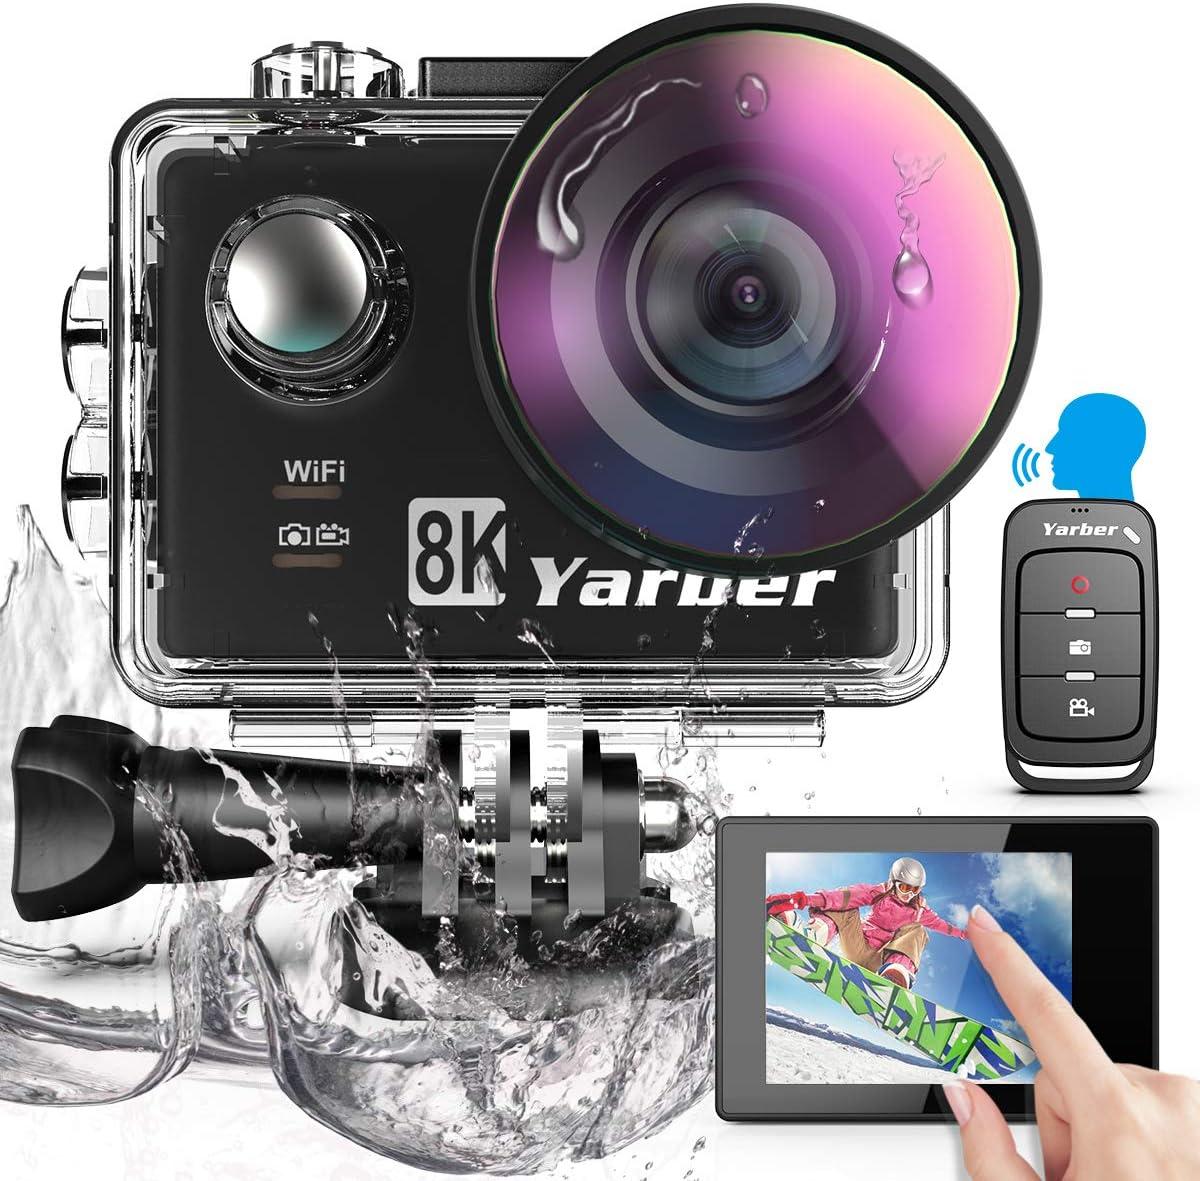 Yarber Cámara Deportiva WiFi 8K 20MP Ultra HD Cámara de Acción EIS 8X Zoom 40M Camara Acuática Camaras Acción Sumergible con 2 Baterías, Pantalla Táctil Control de Voz Anti-temblor Lapso de Tiempo